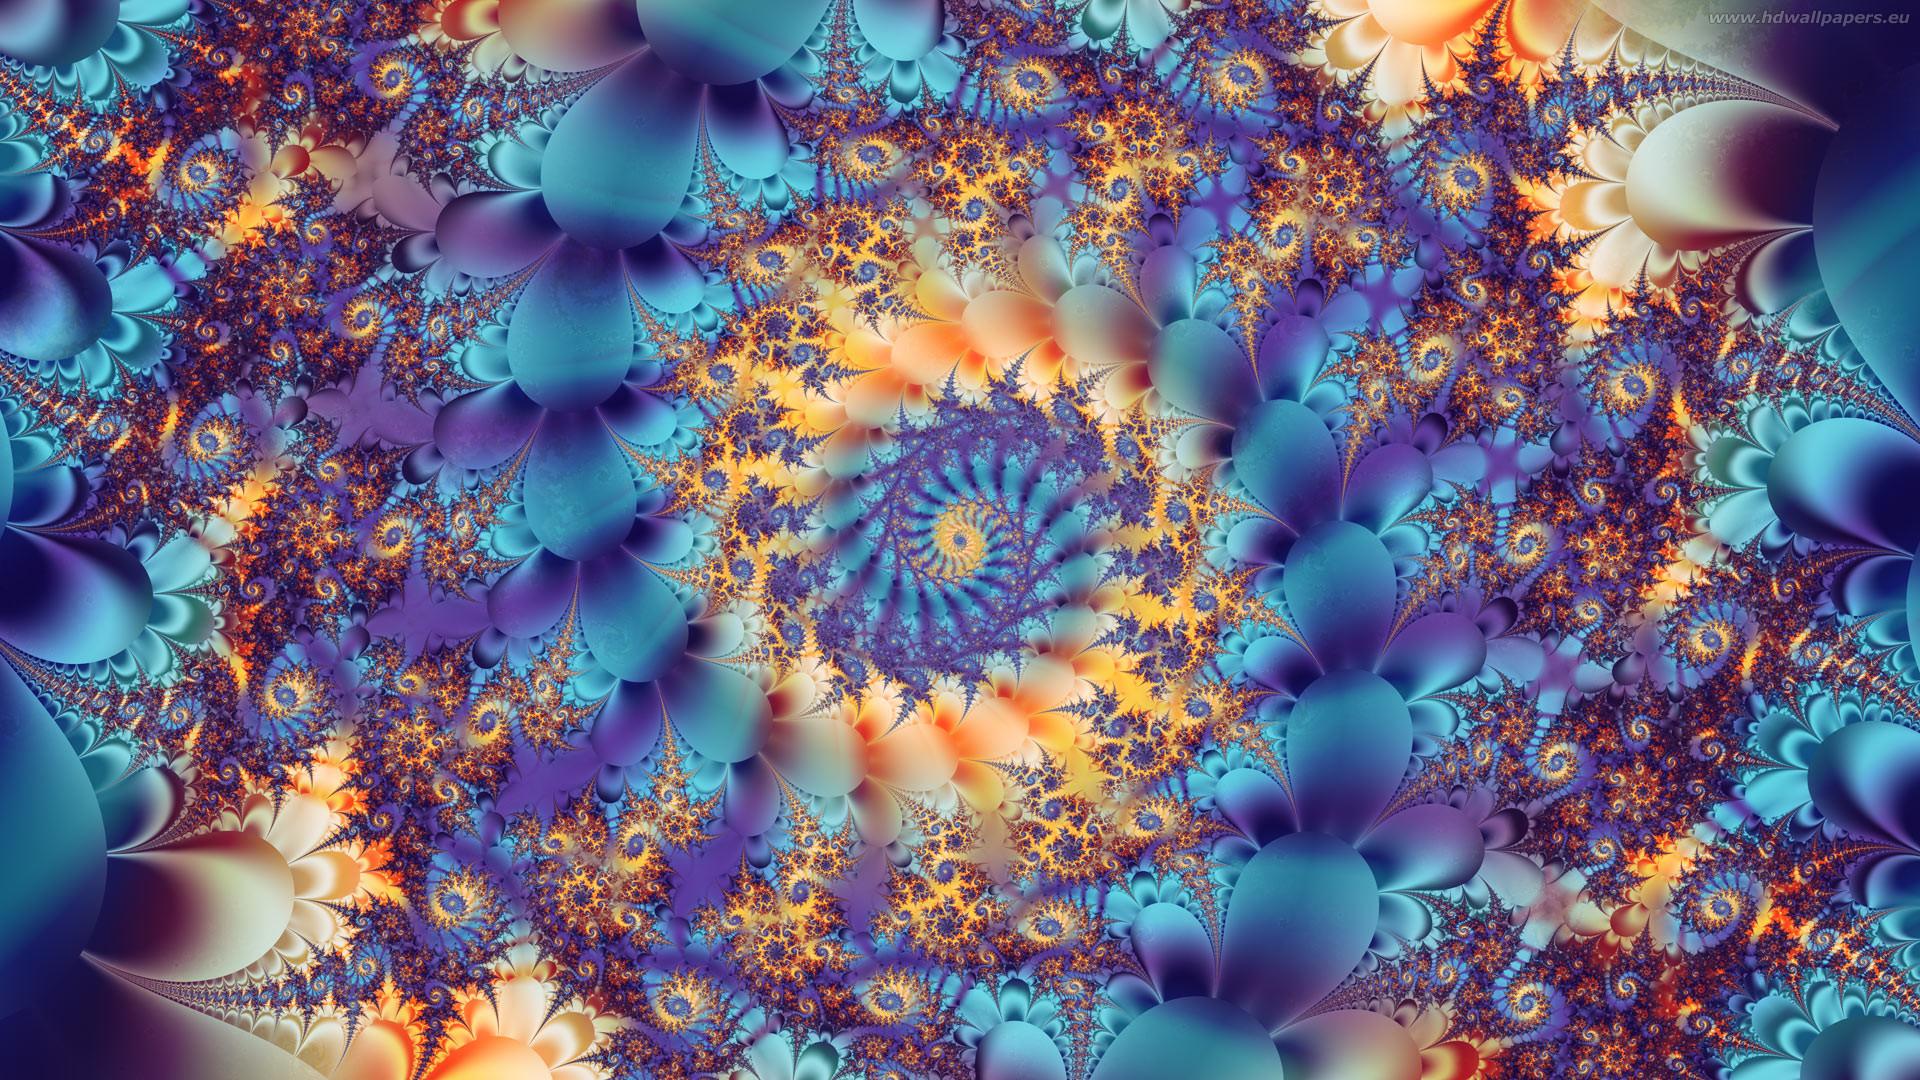 https://www.winnersedgetrading.com/wp-content/uploads/2013/03/fractal.jpg